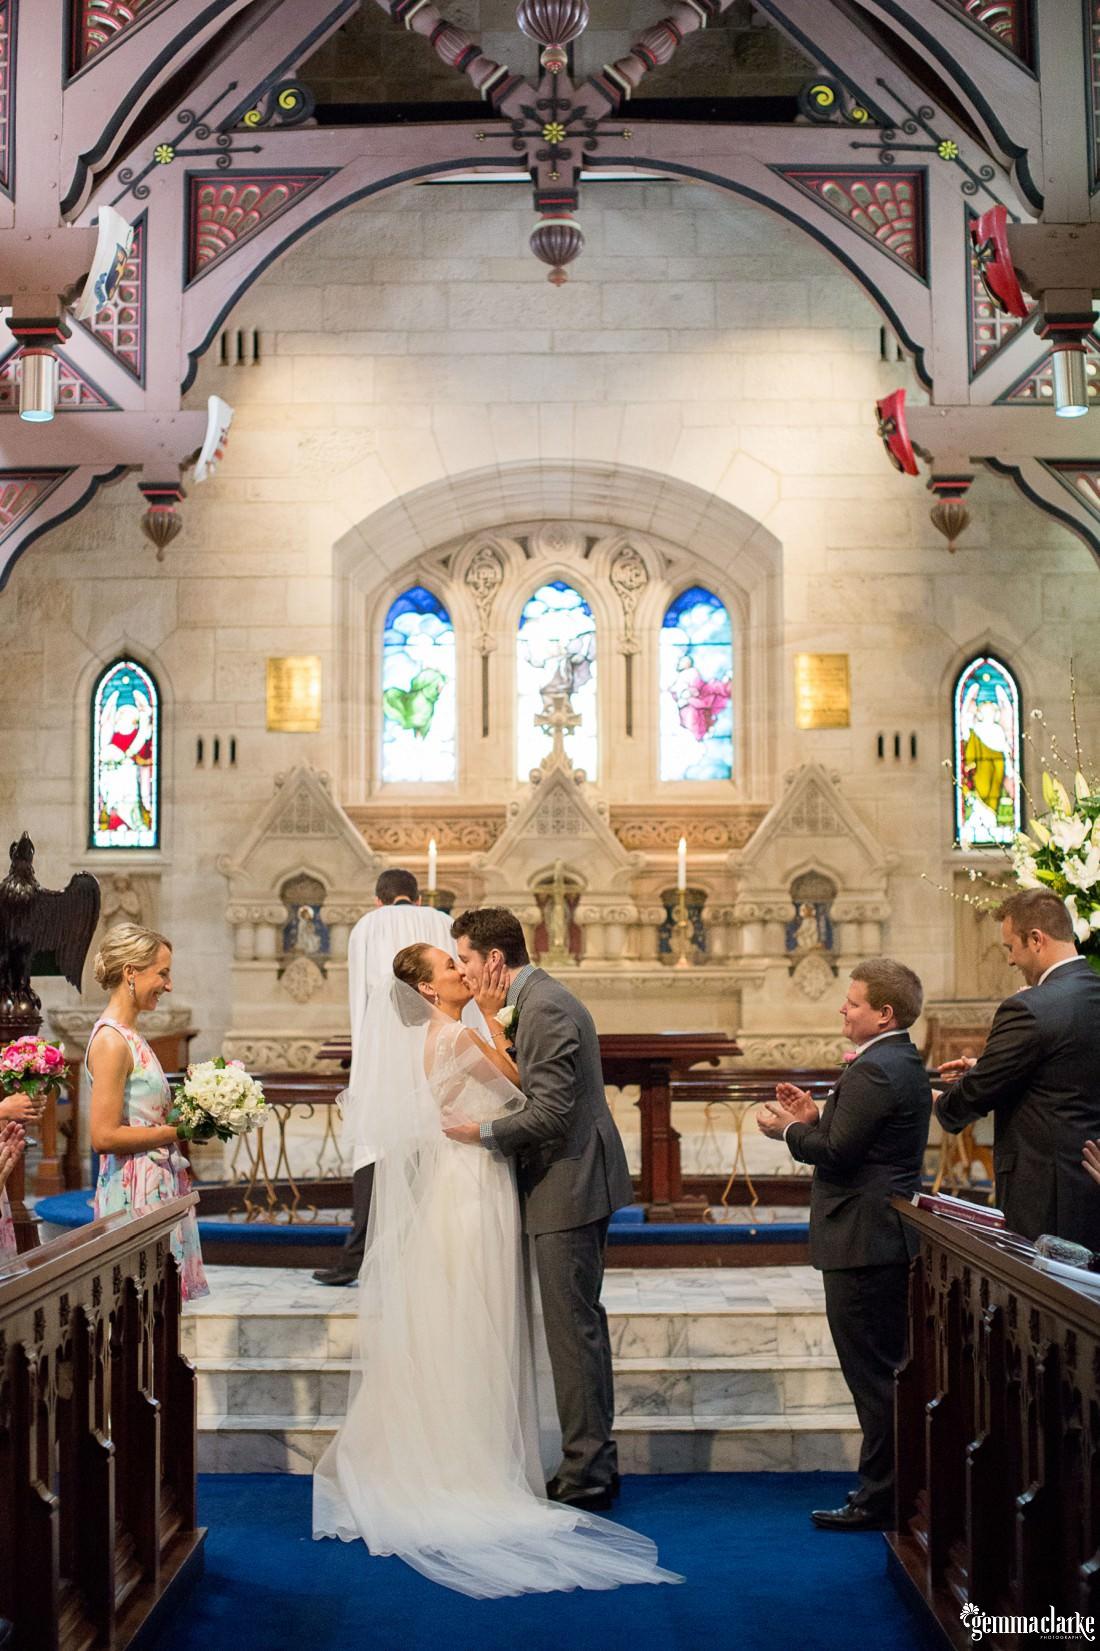 gemma-clarke-photography_kings-school-wedding_balmoral-beach-reception_bathers-pavilion-wedding_luisa-and-nick_0030